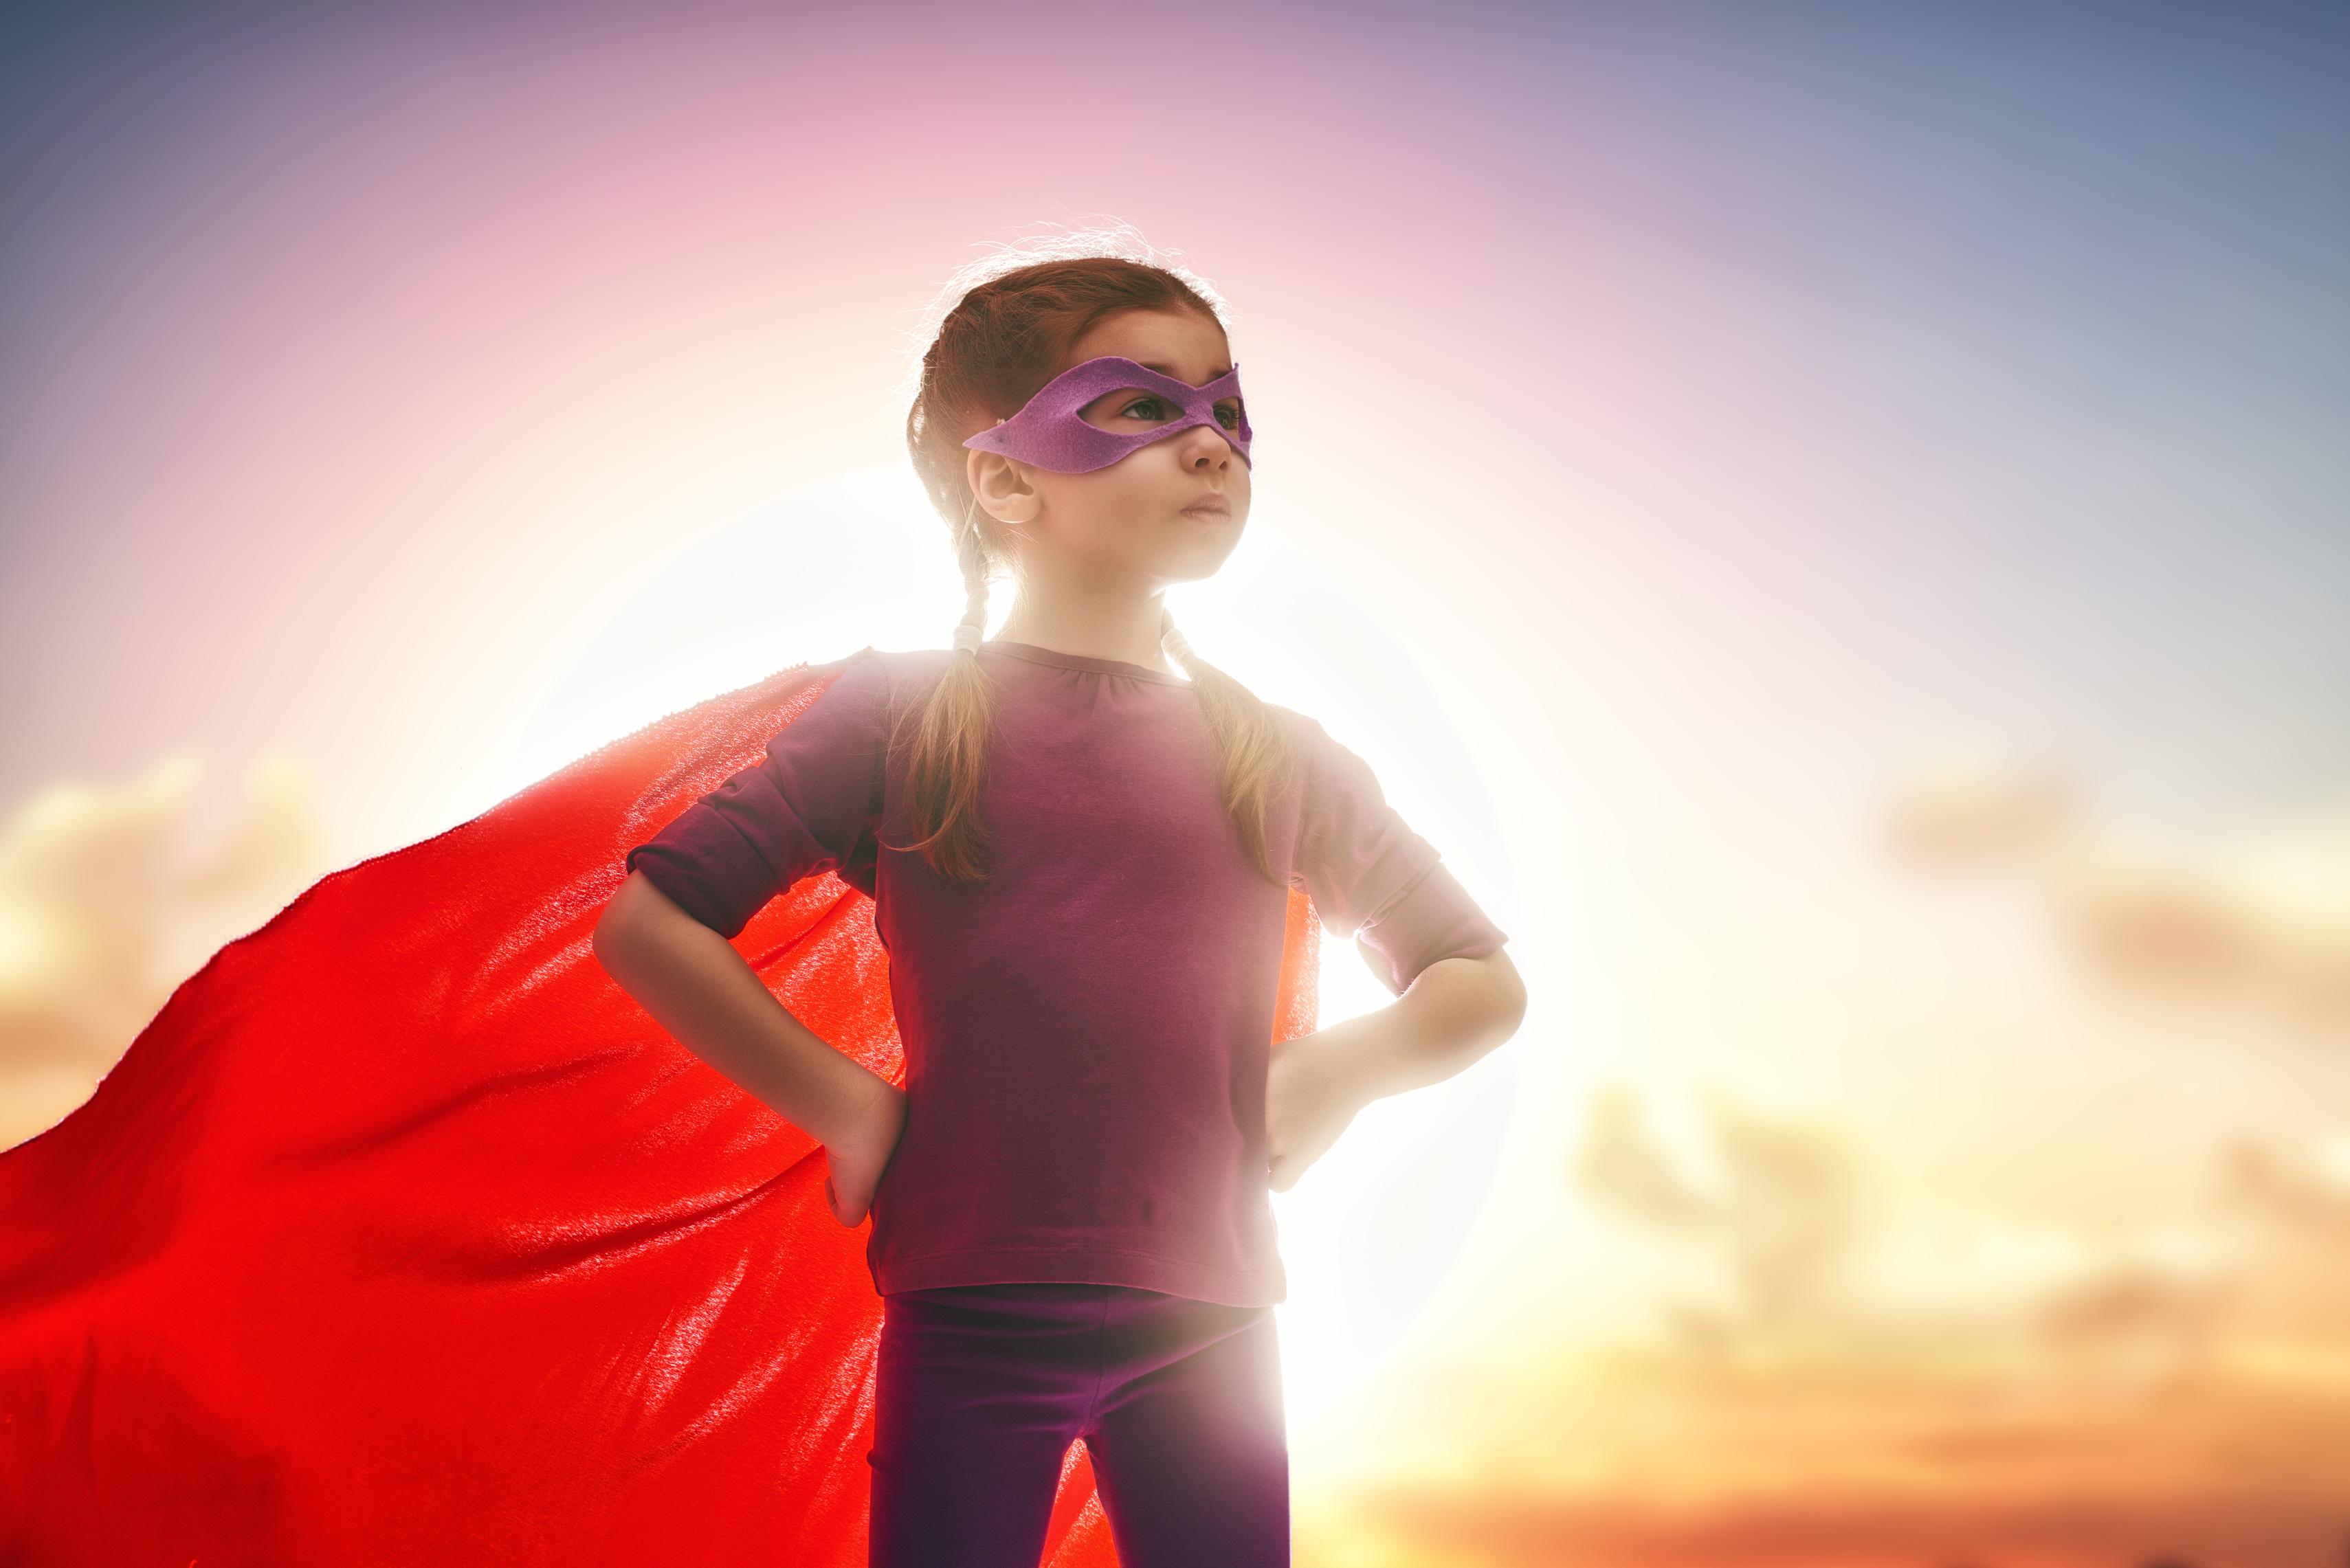 Little child girl plays superhero. Child on the background of sunset sky. Girl power concept